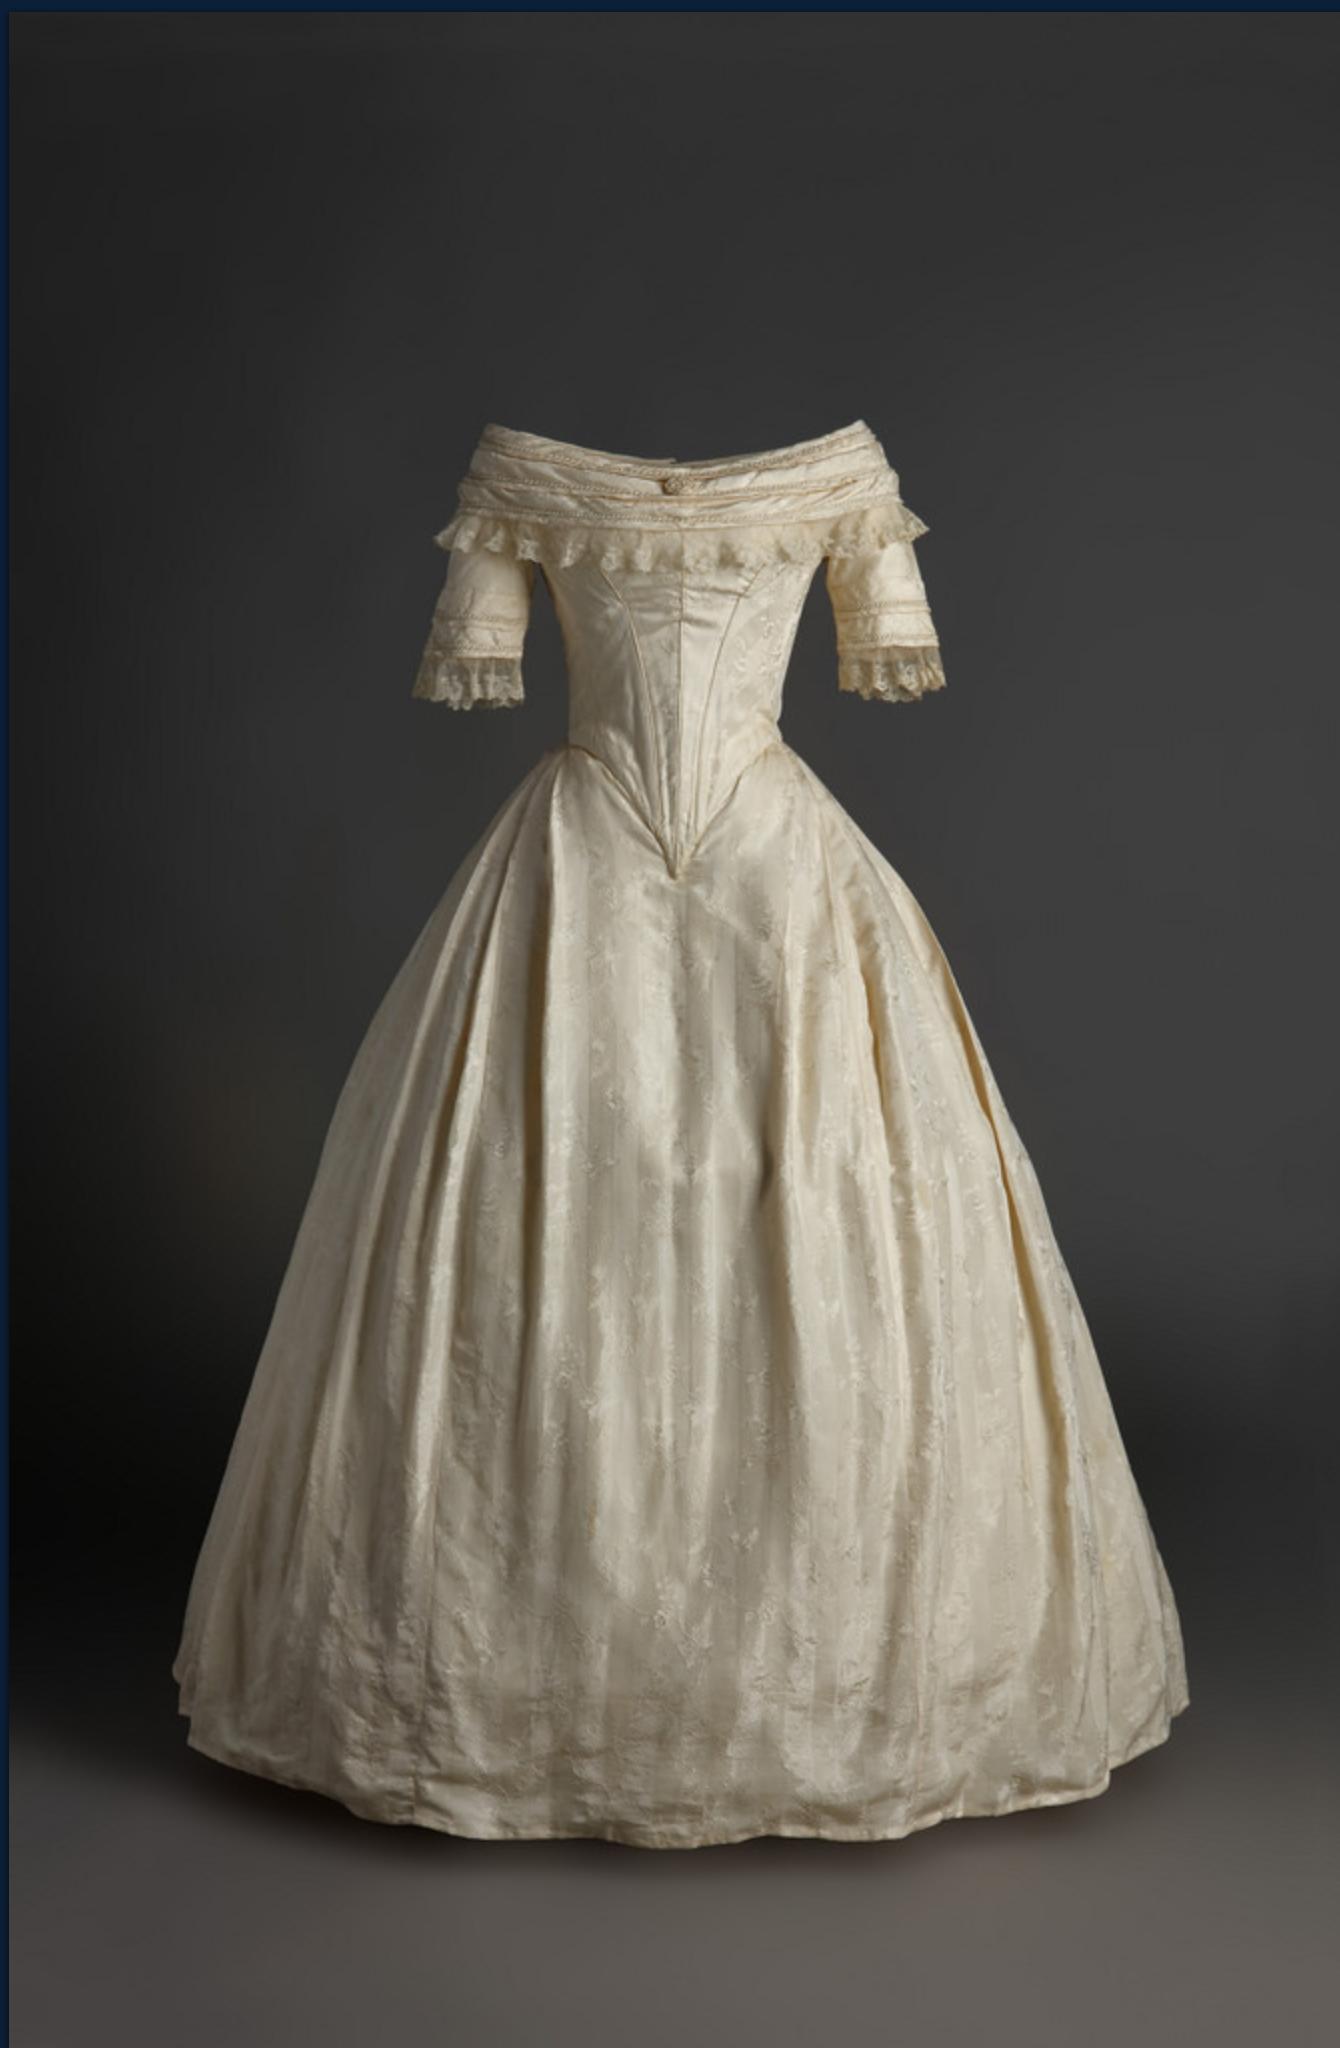 Vestido de novia de seda labrada. 1840. Museo del Traje. Madrid.